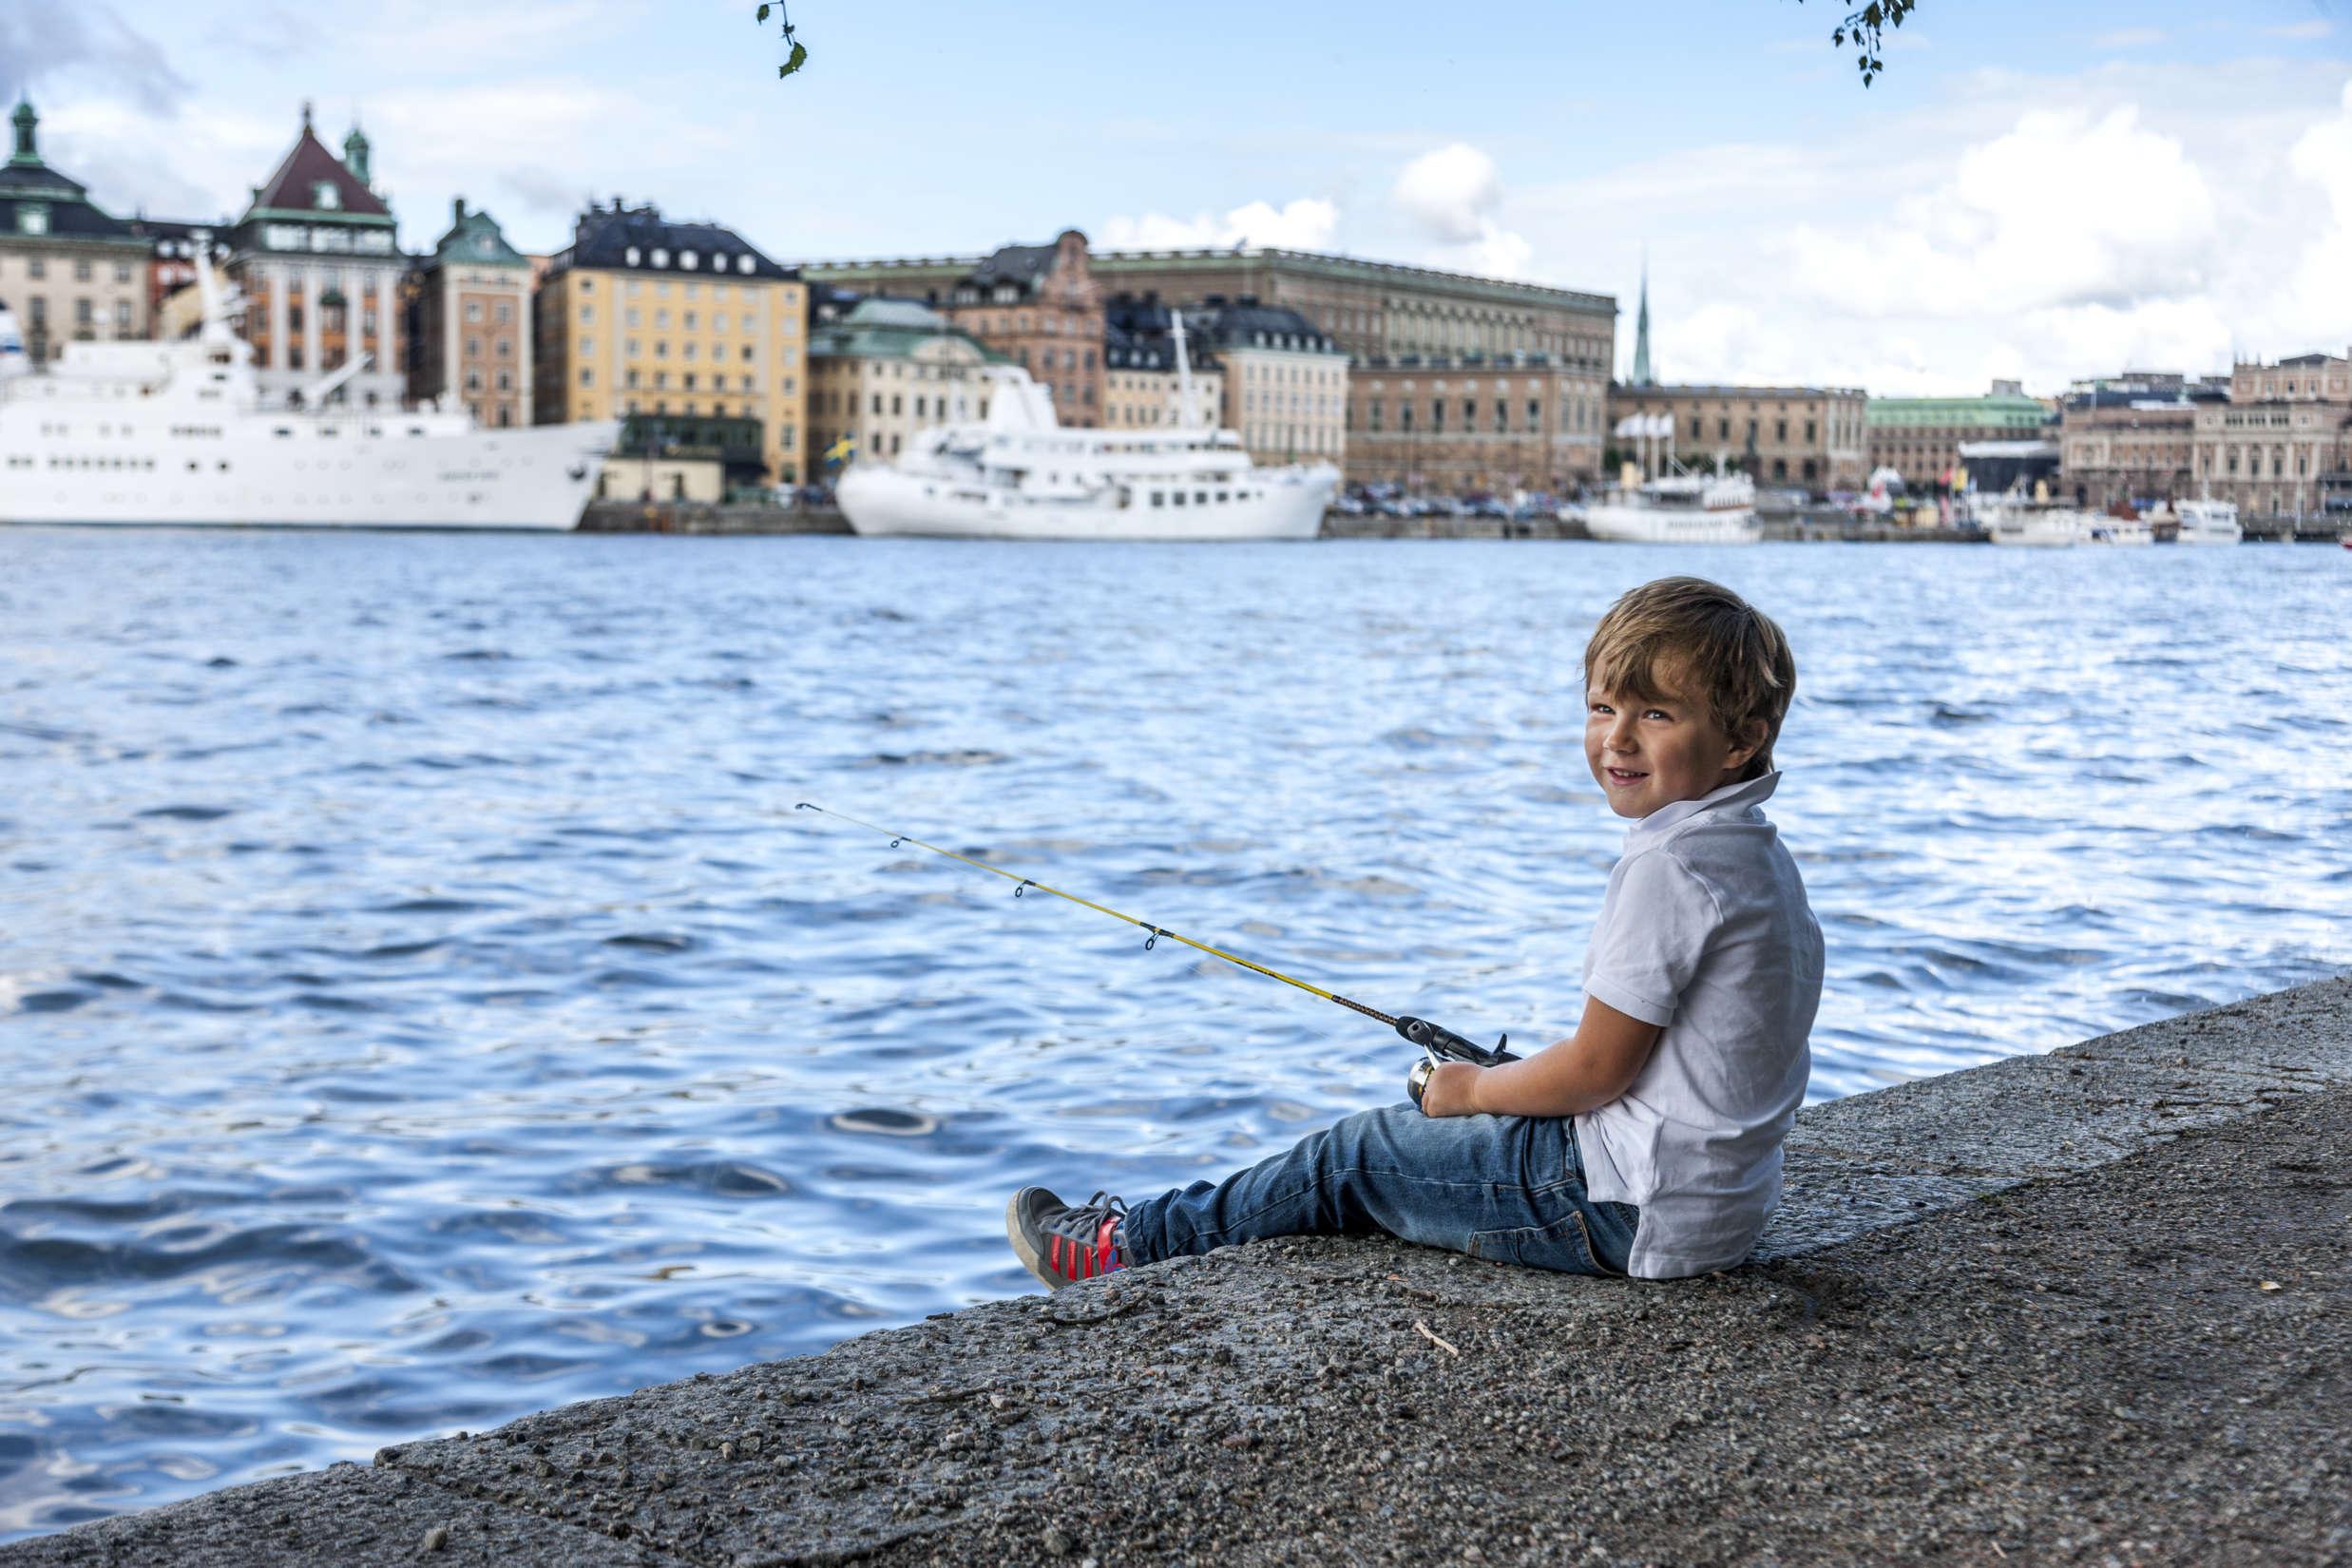 Trygg_Fishing_Sthlm_14_050